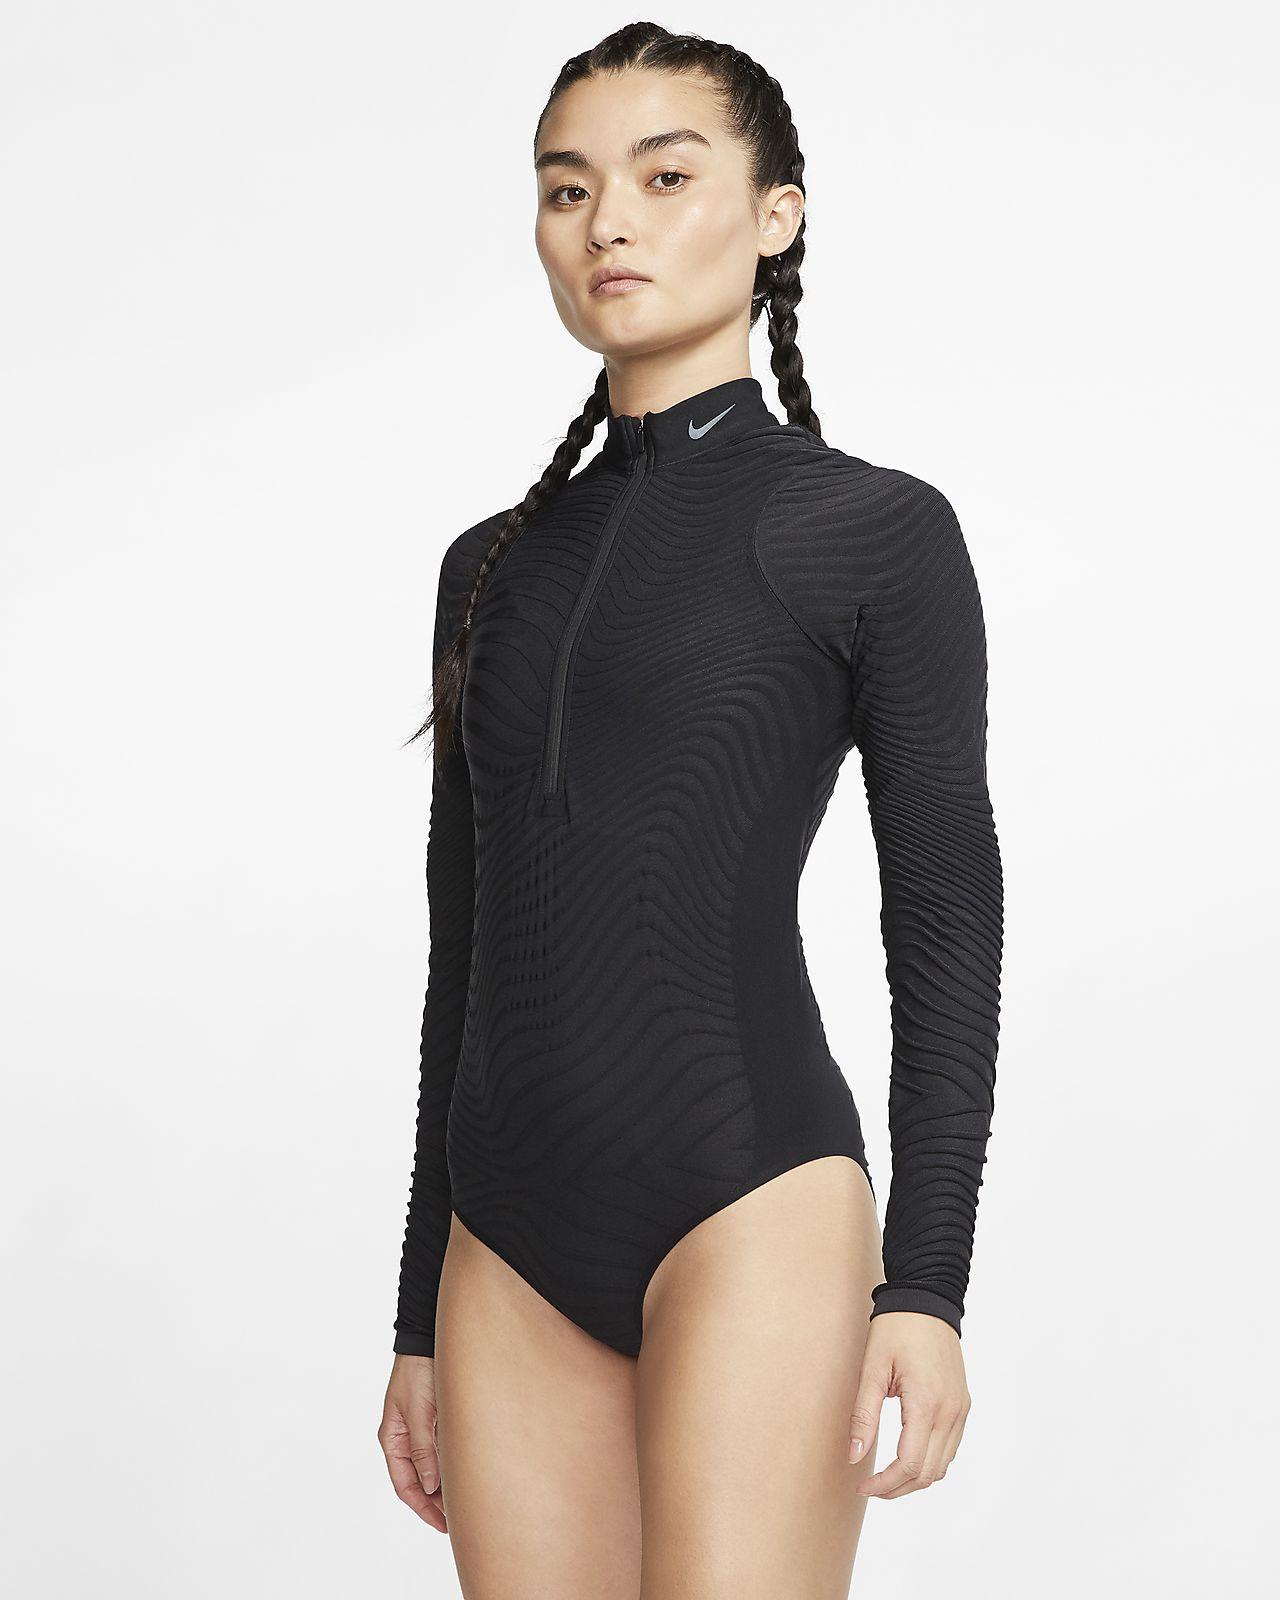 Nike City Ready Women's Seamless Long-Sleeve Training Bodysuit